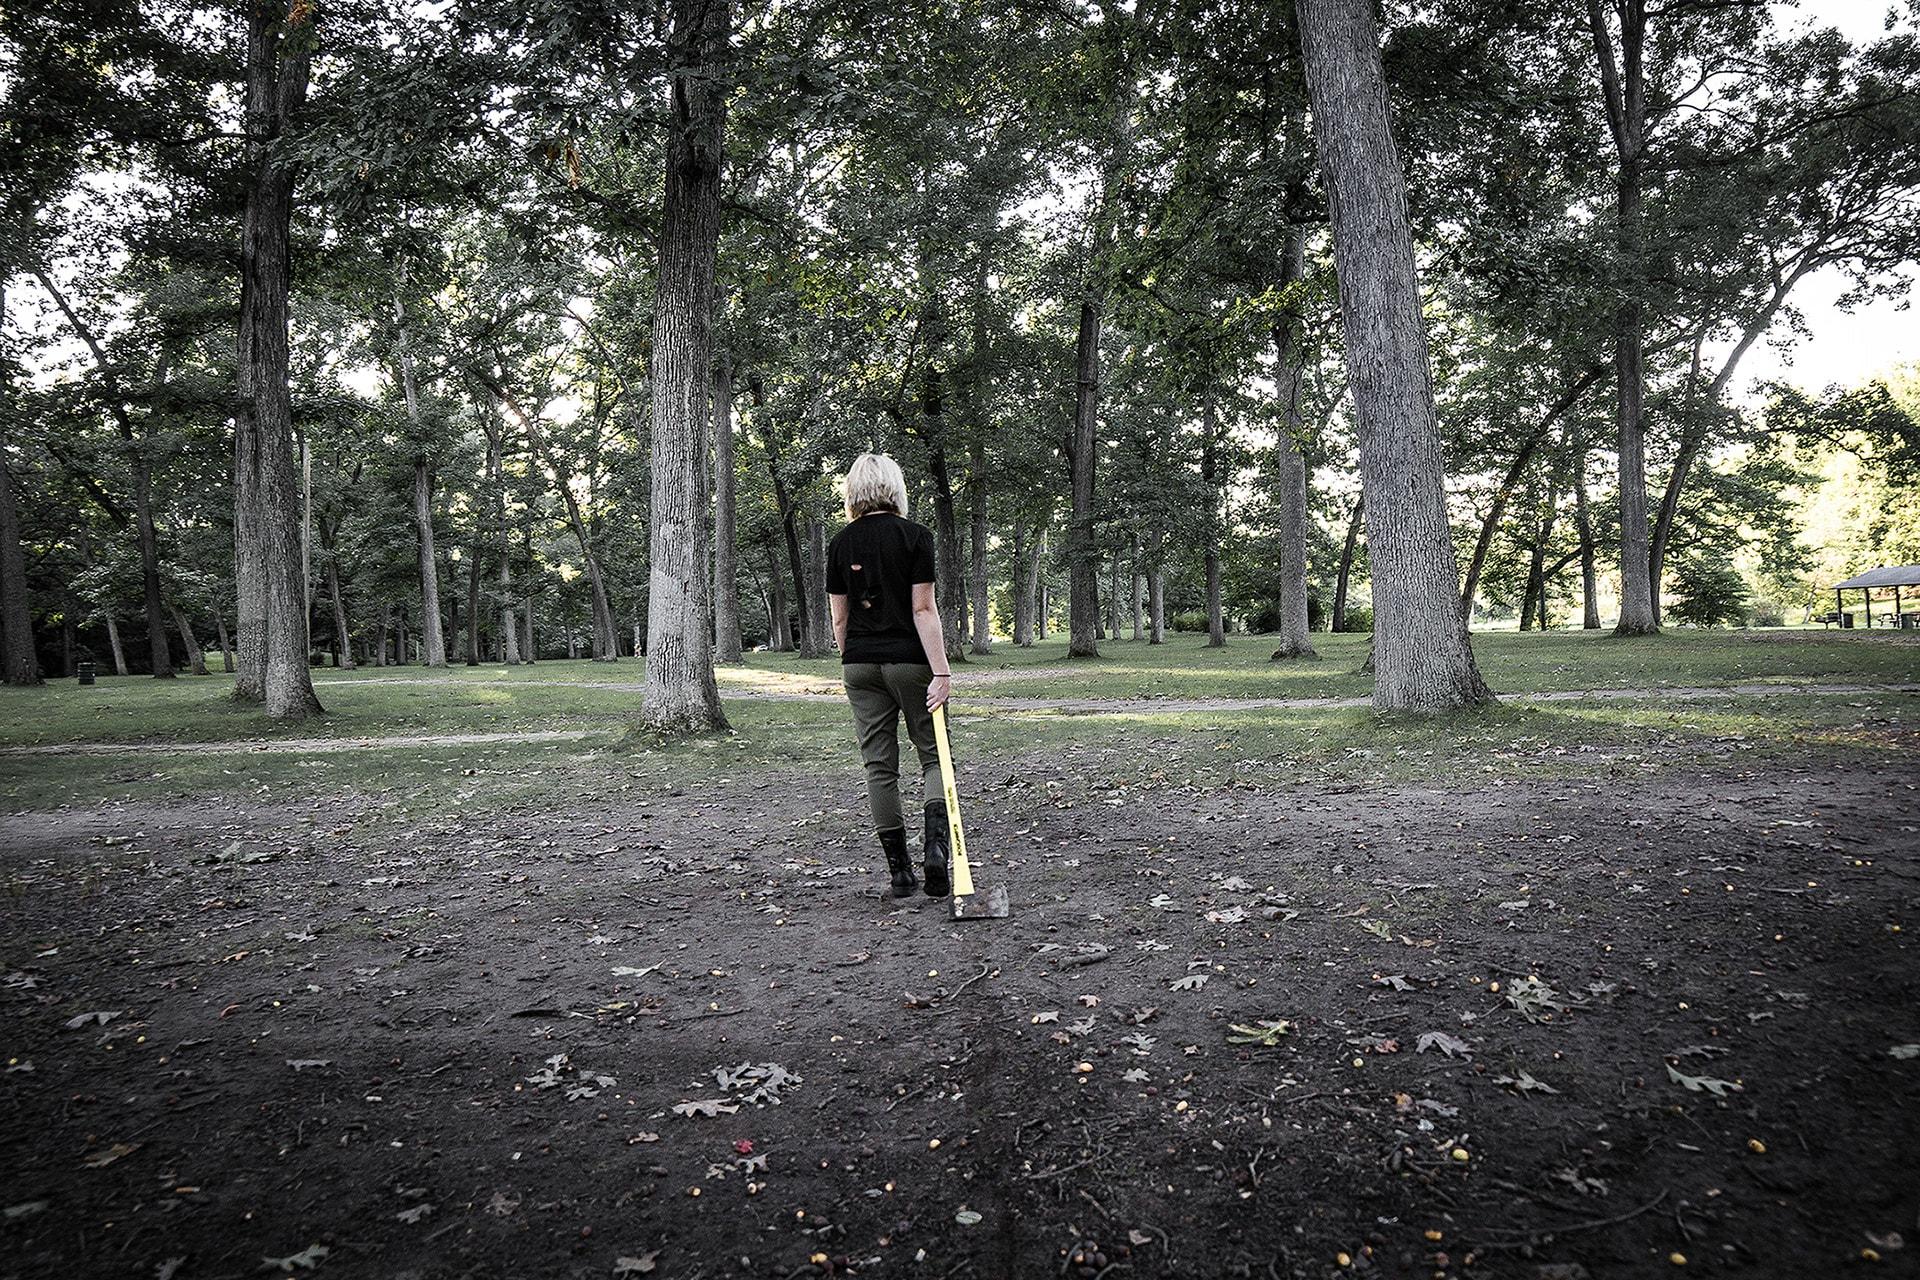 simpson-h-woods-creep-1-iphone-9-min.jpg